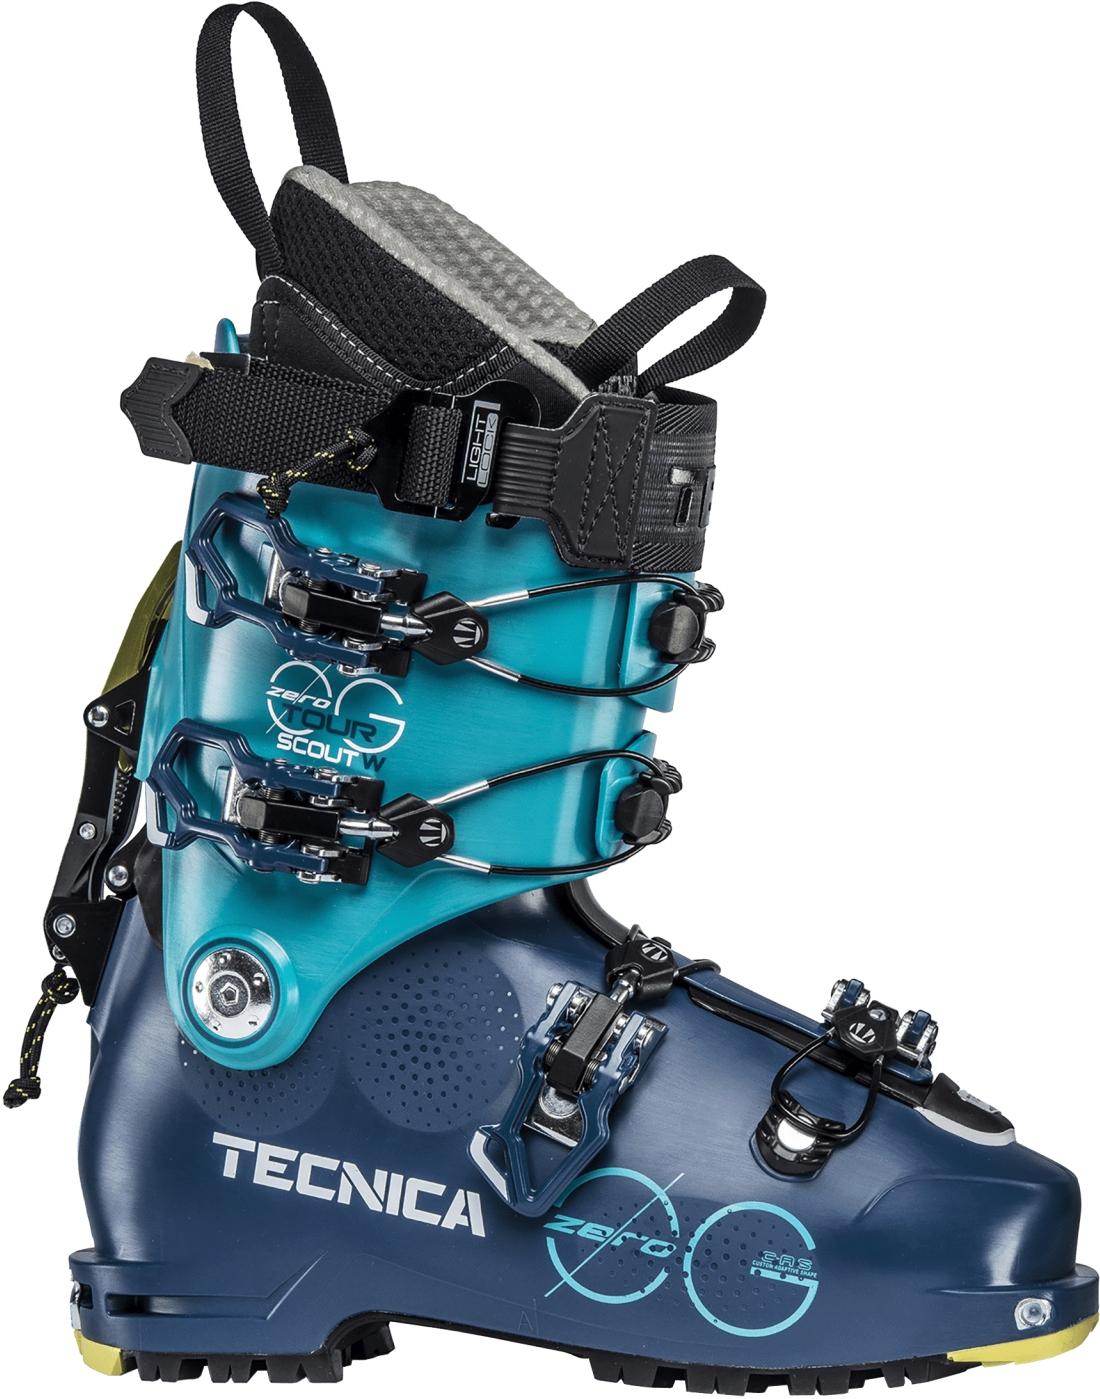 Tecnica Zero G Tour Scout W - ocean blue/blue bird 245